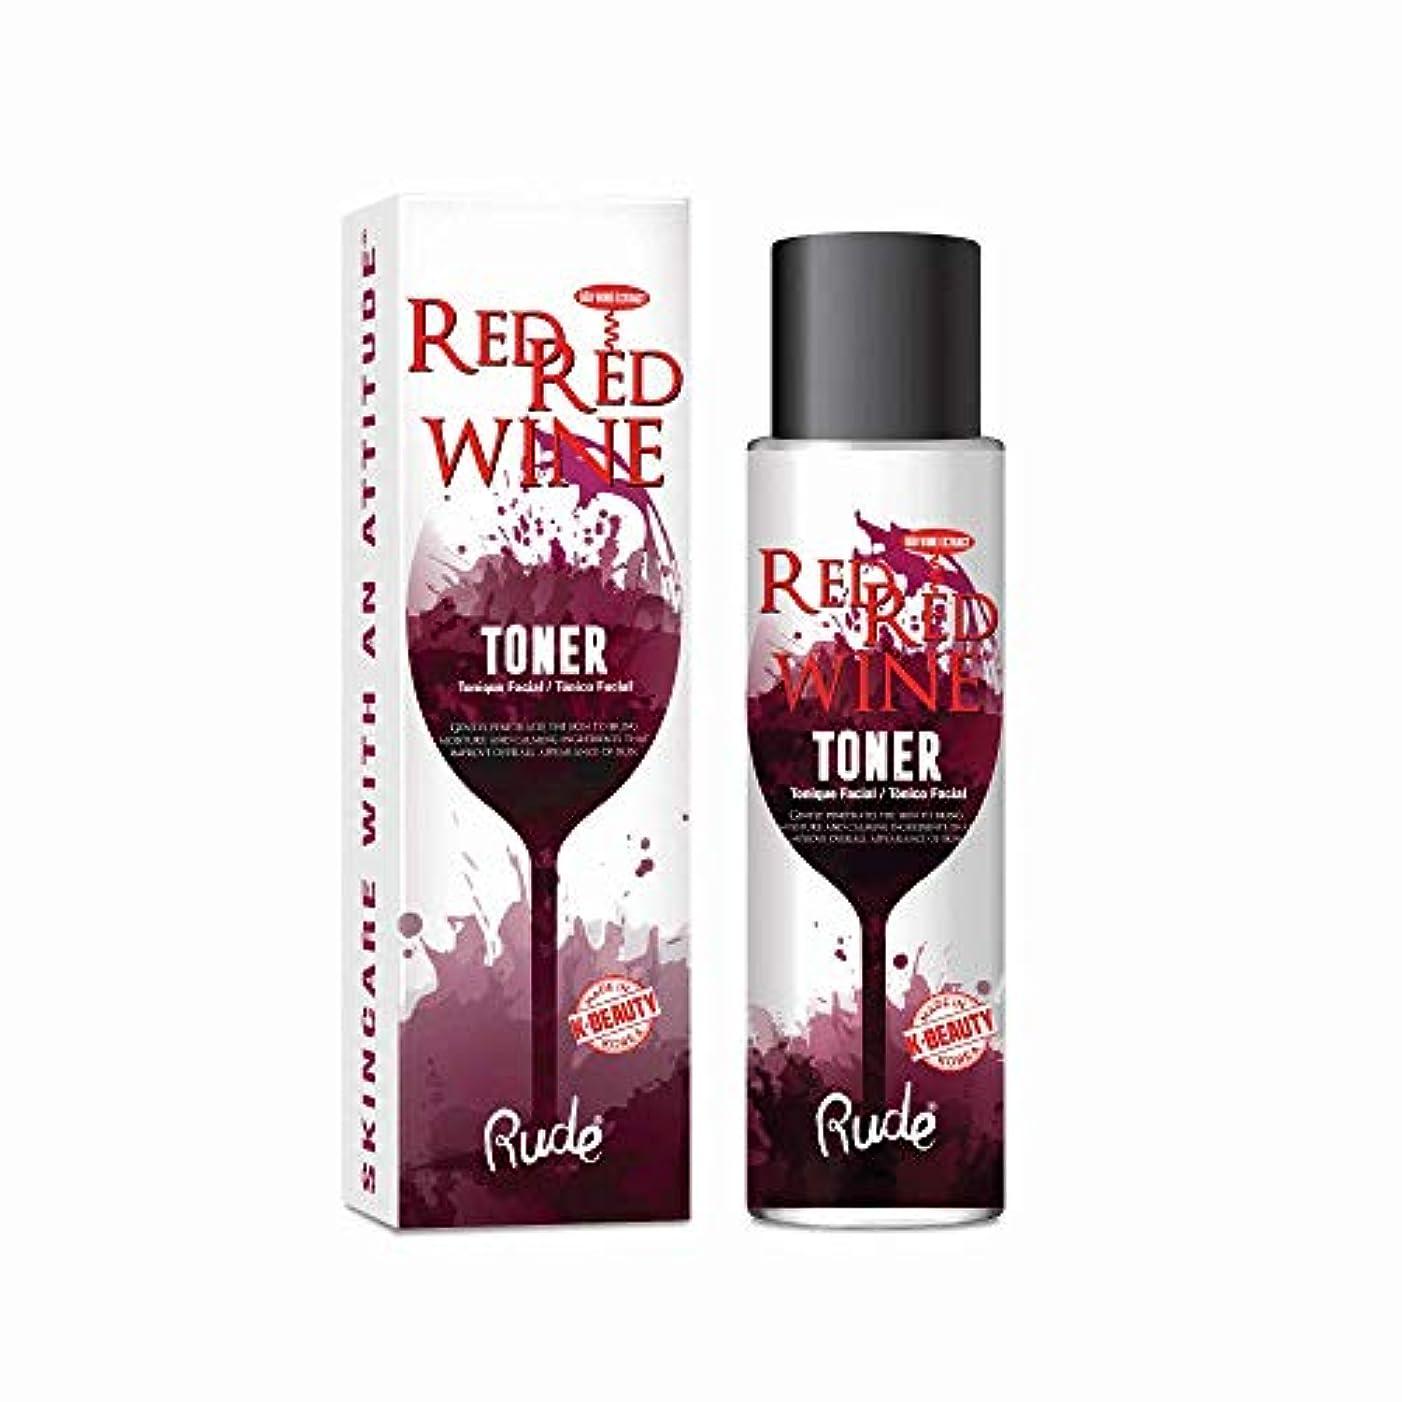 (3 Pack) RUDE Red Red Wine Toner (並行輸入品)